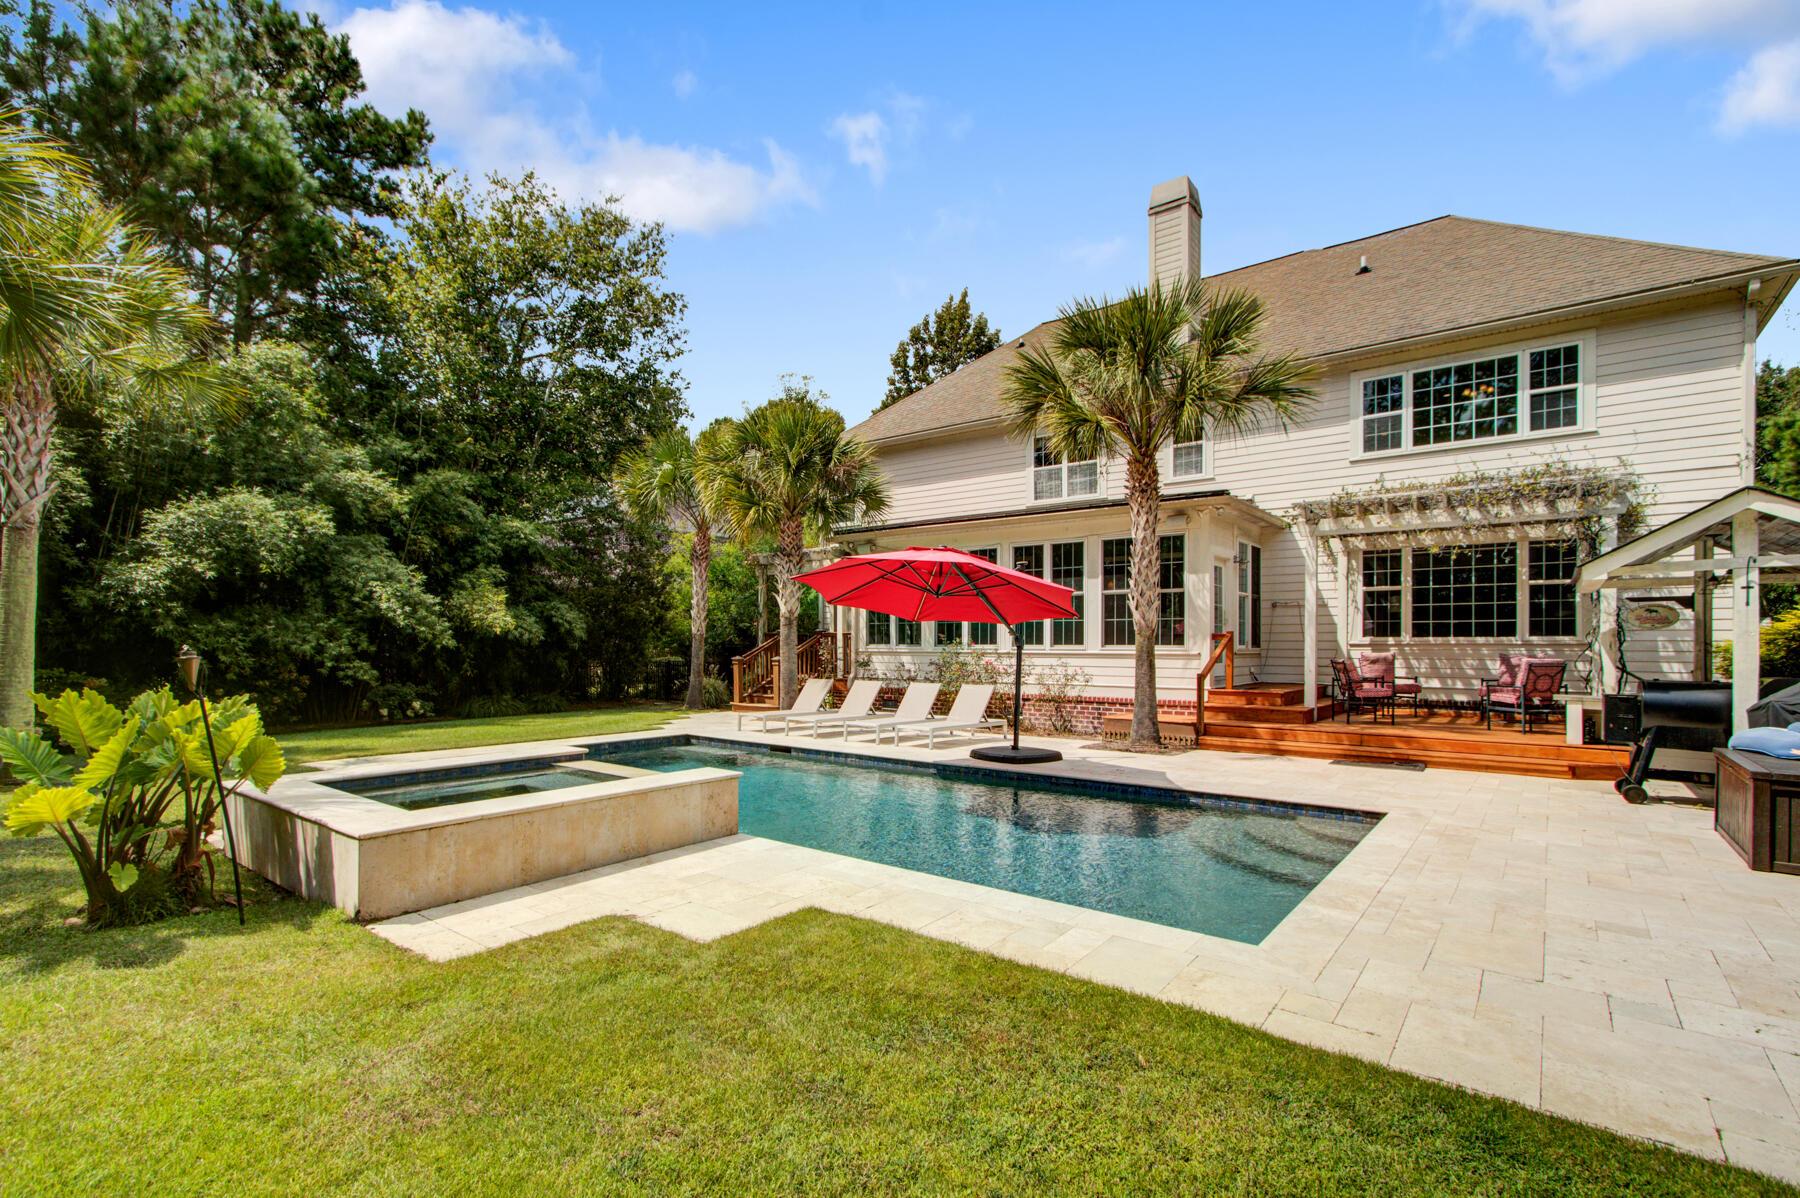 Dunes West Homes For Sale - 3095 Pignatelli, Mount Pleasant, SC - 34